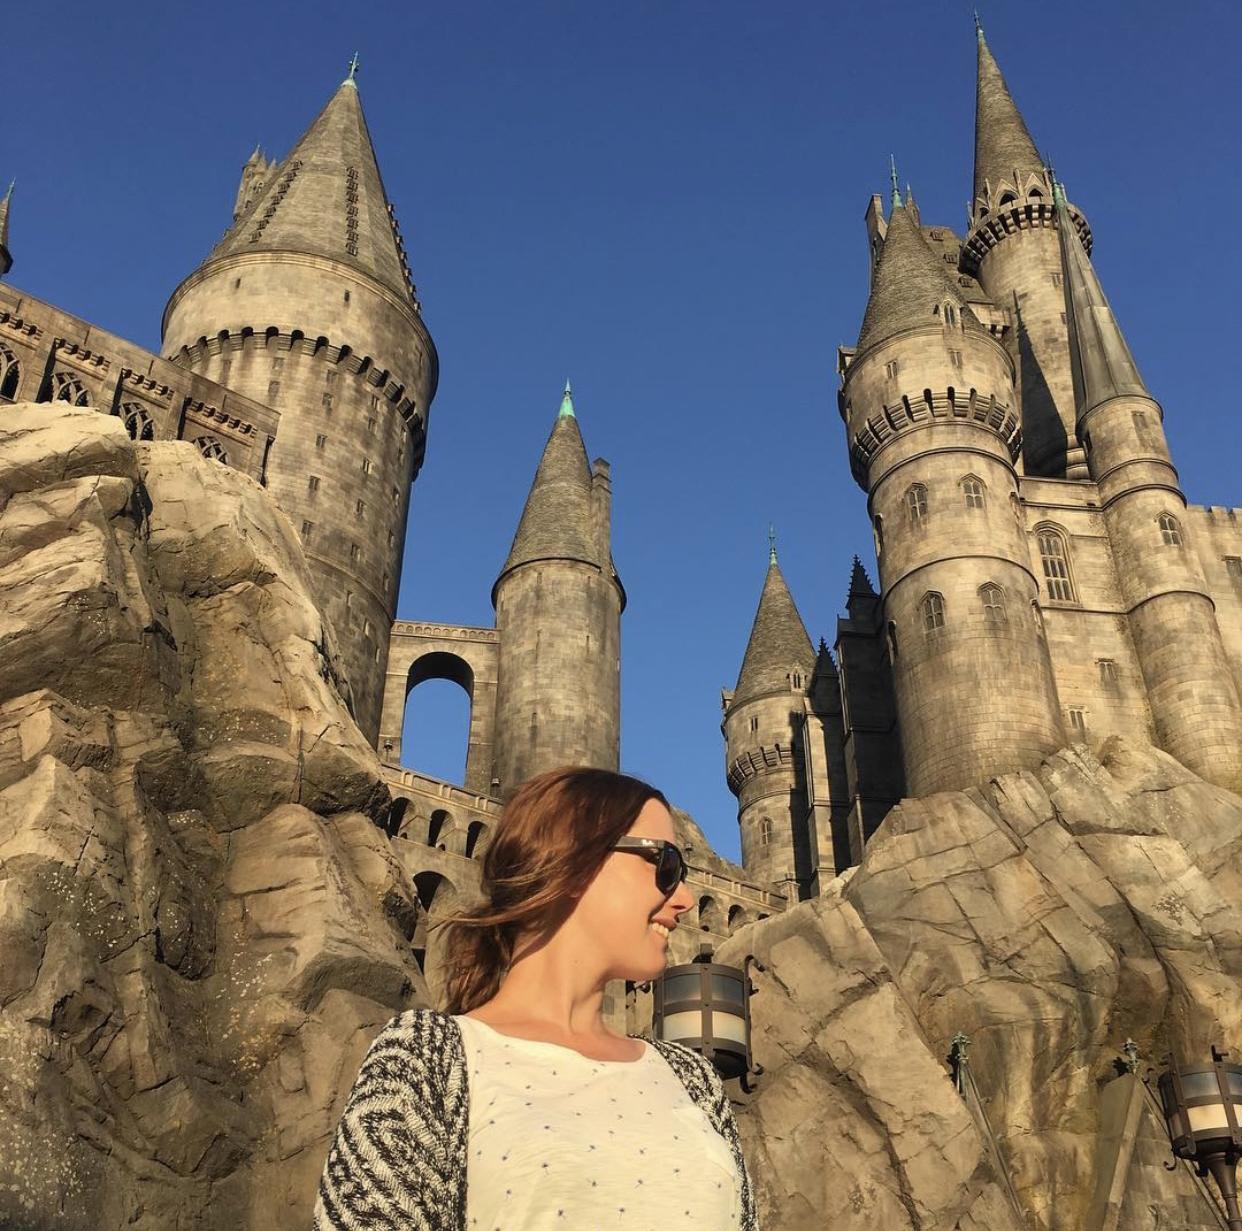 Harry Potter locations